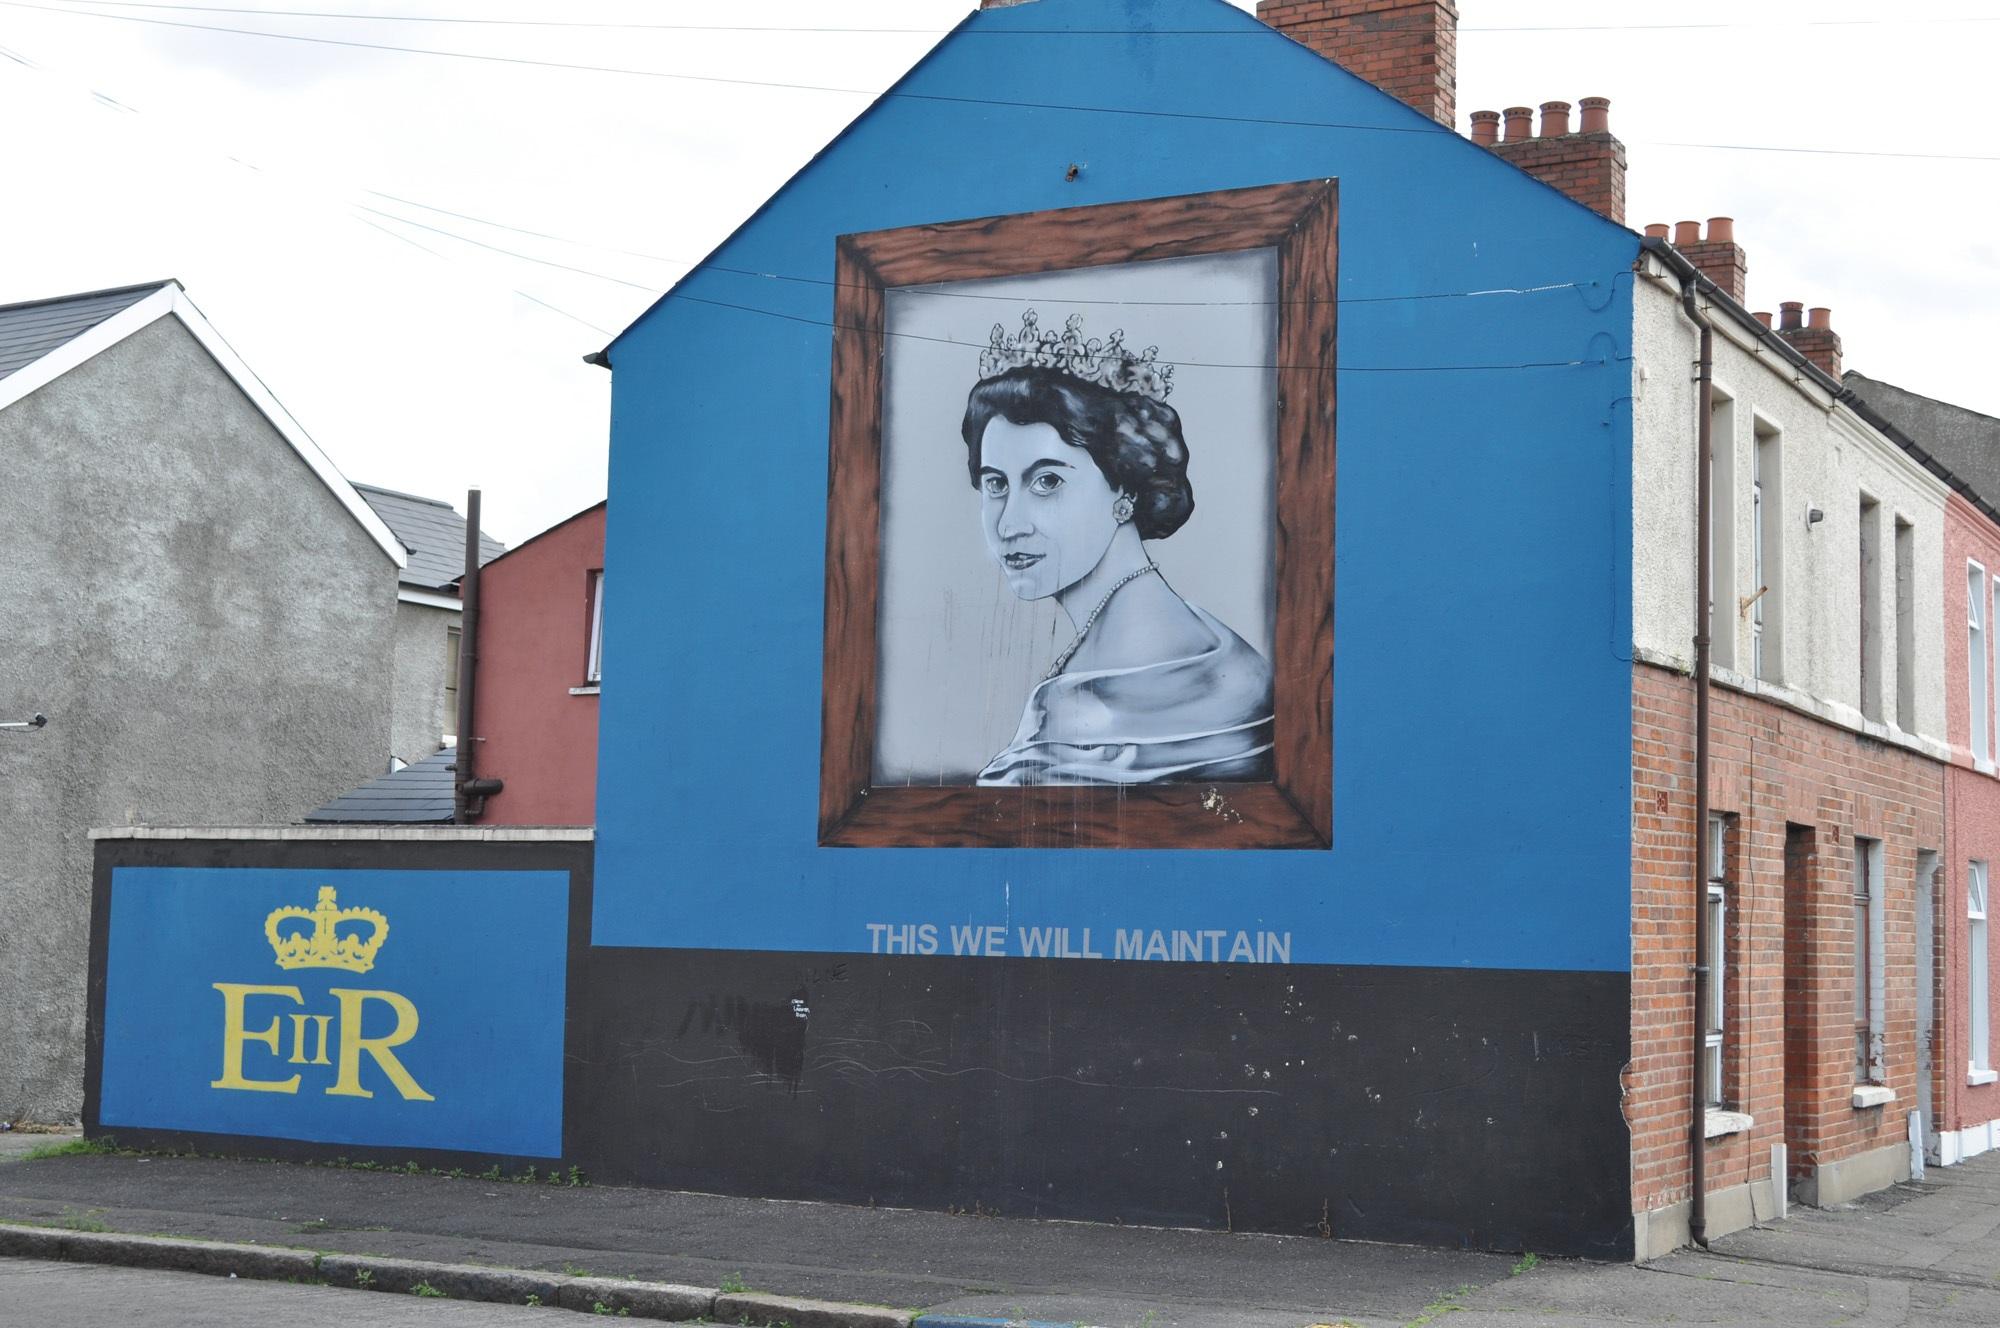 Mural on Rockview Street, Belfast. Painted 2007.